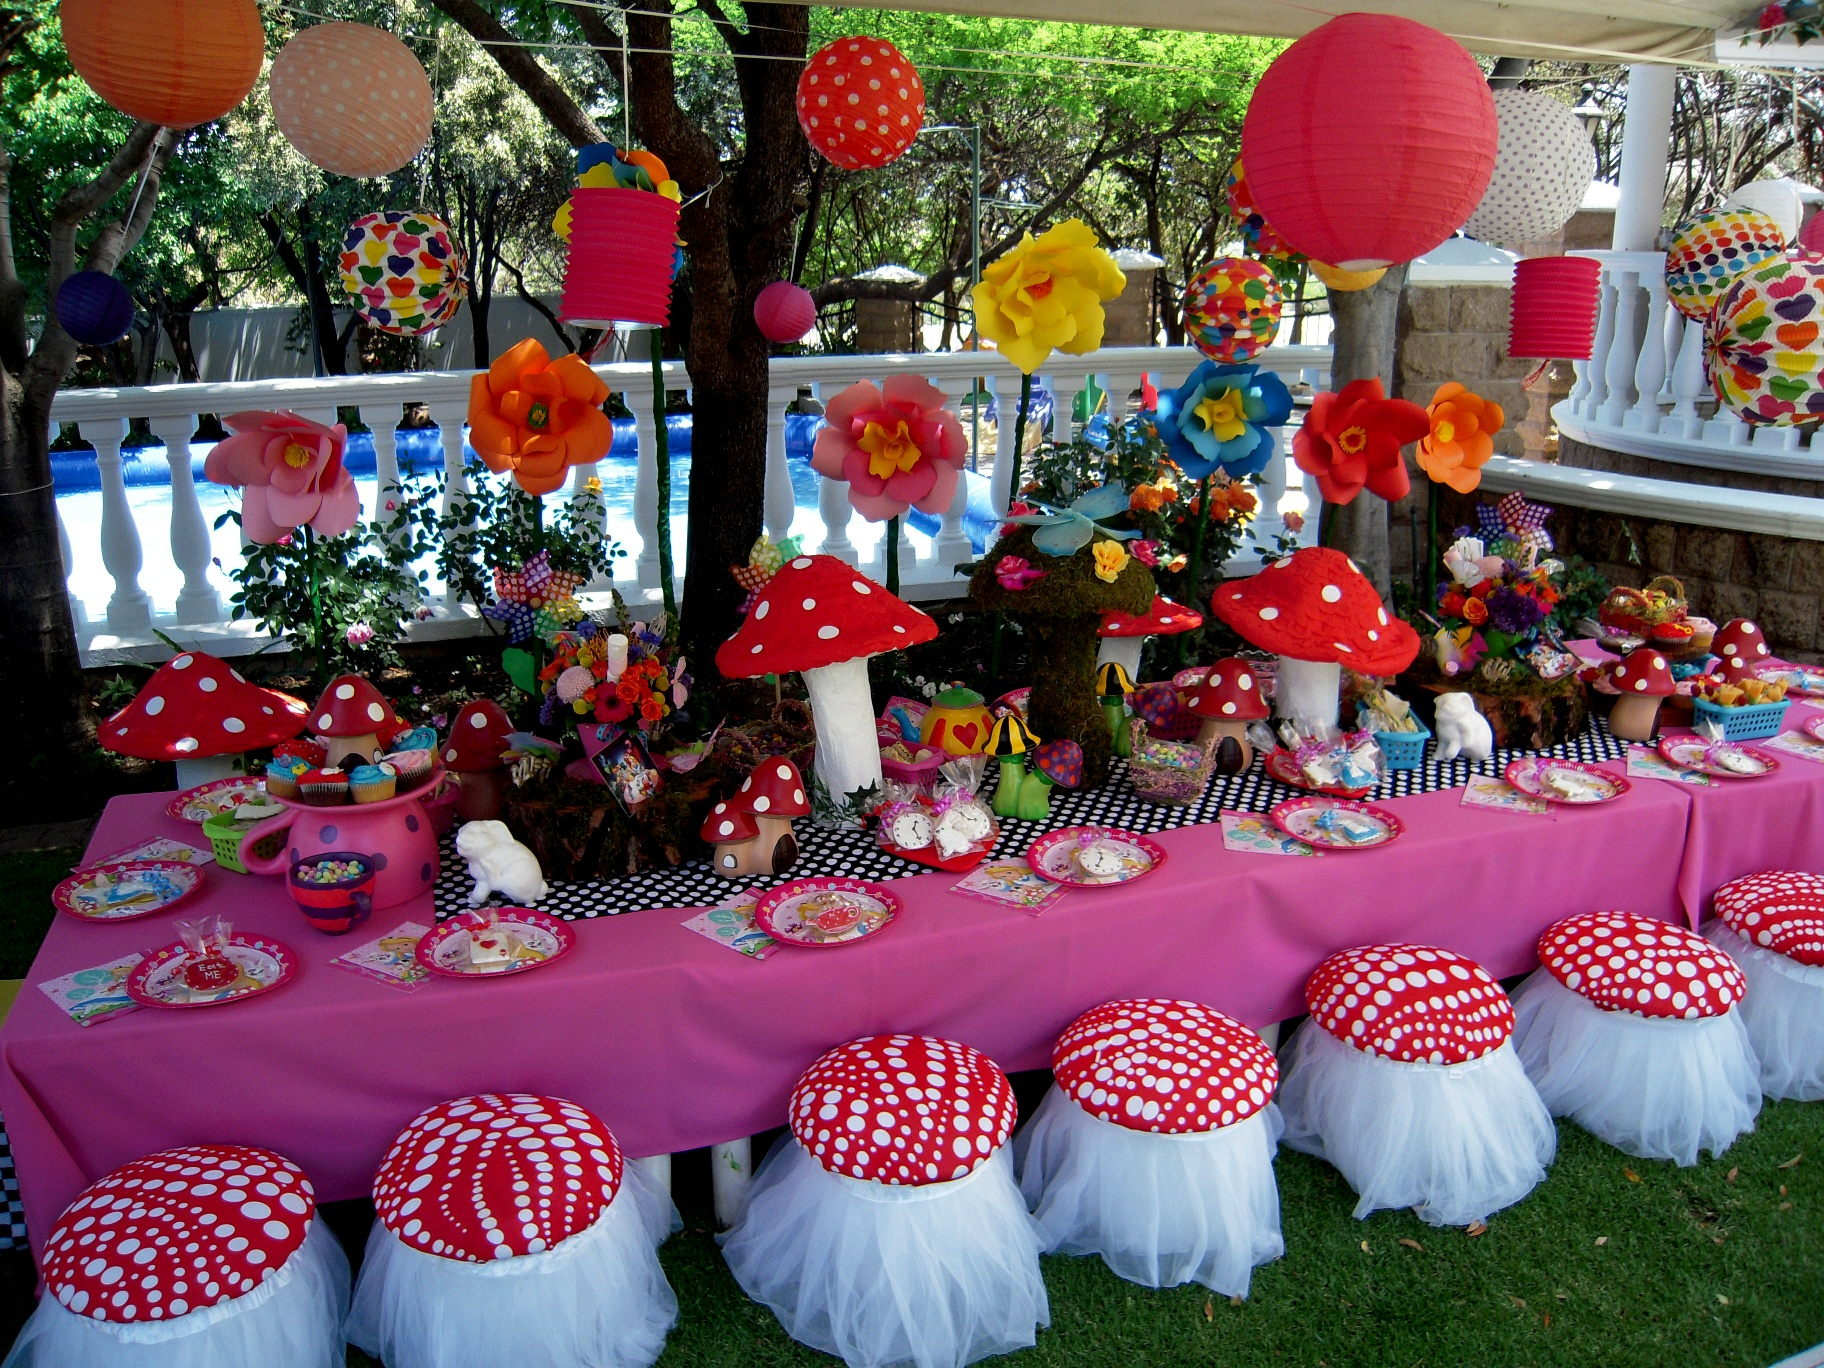 Alice In Wonderland Decorations Hedgehog Lanethemed Party Decor Alice In Wonderland